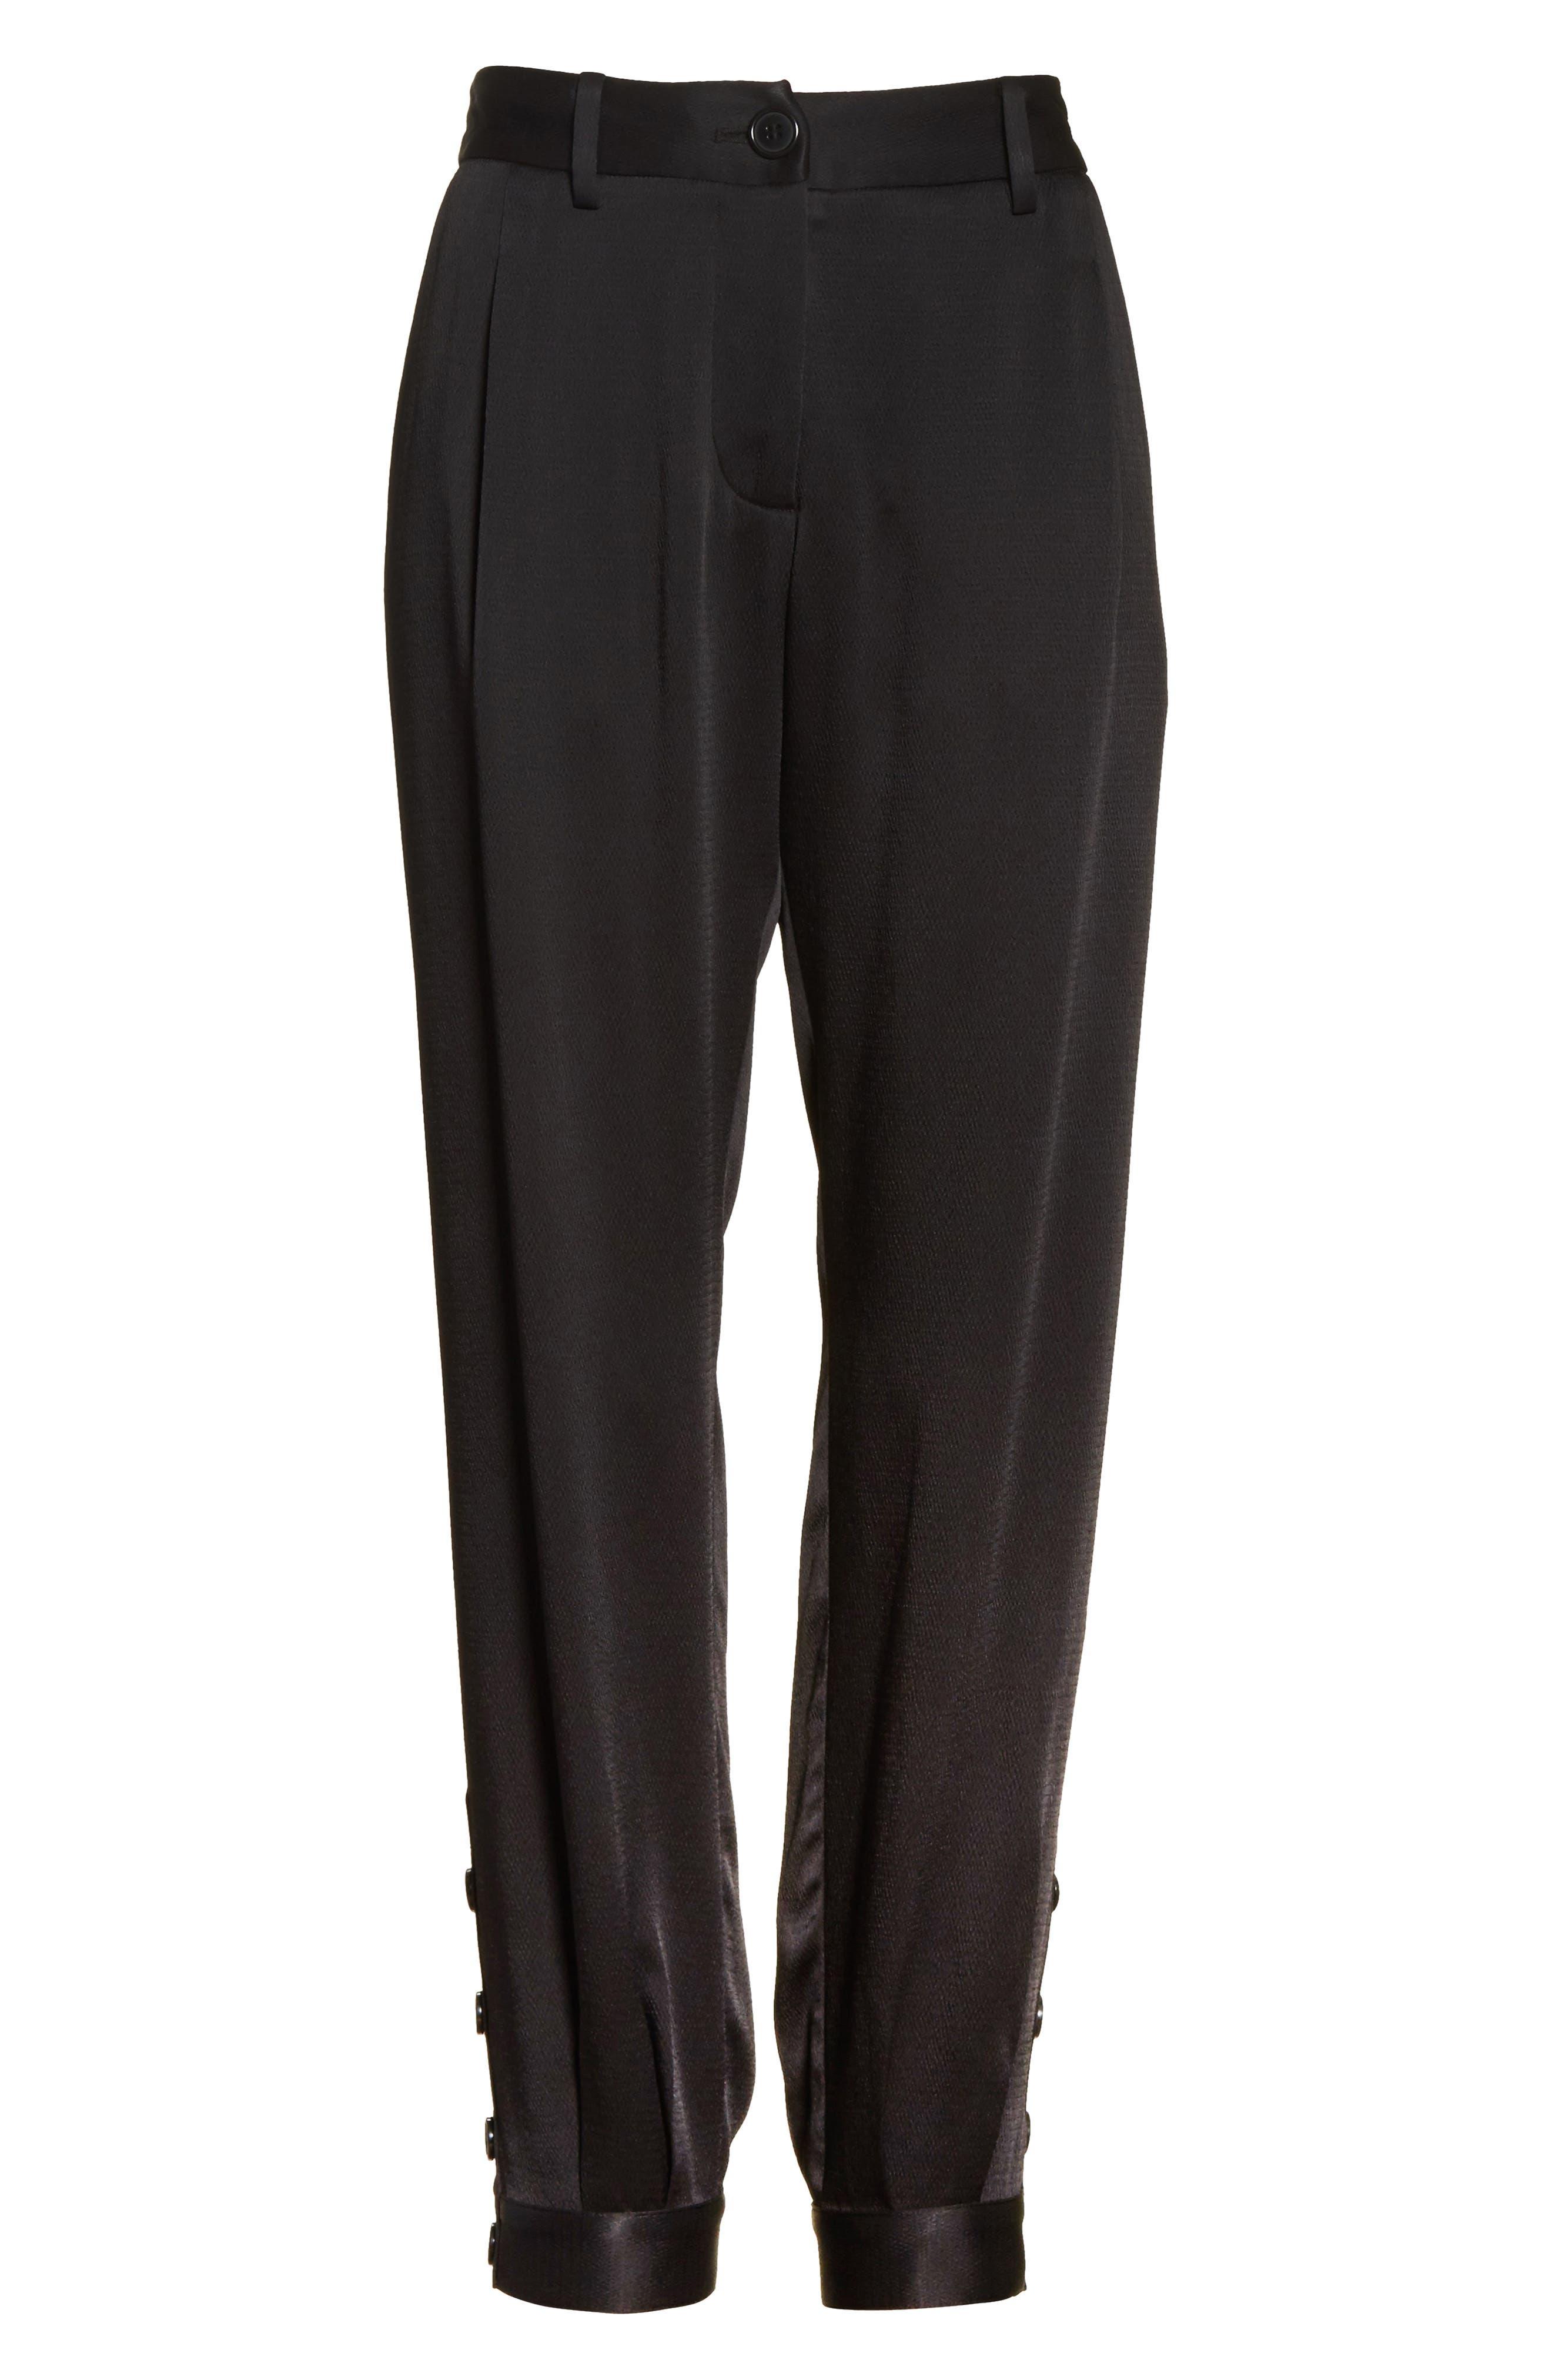 Bertina Pleated Crop Pants,                             Alternate thumbnail 6, color,                             003